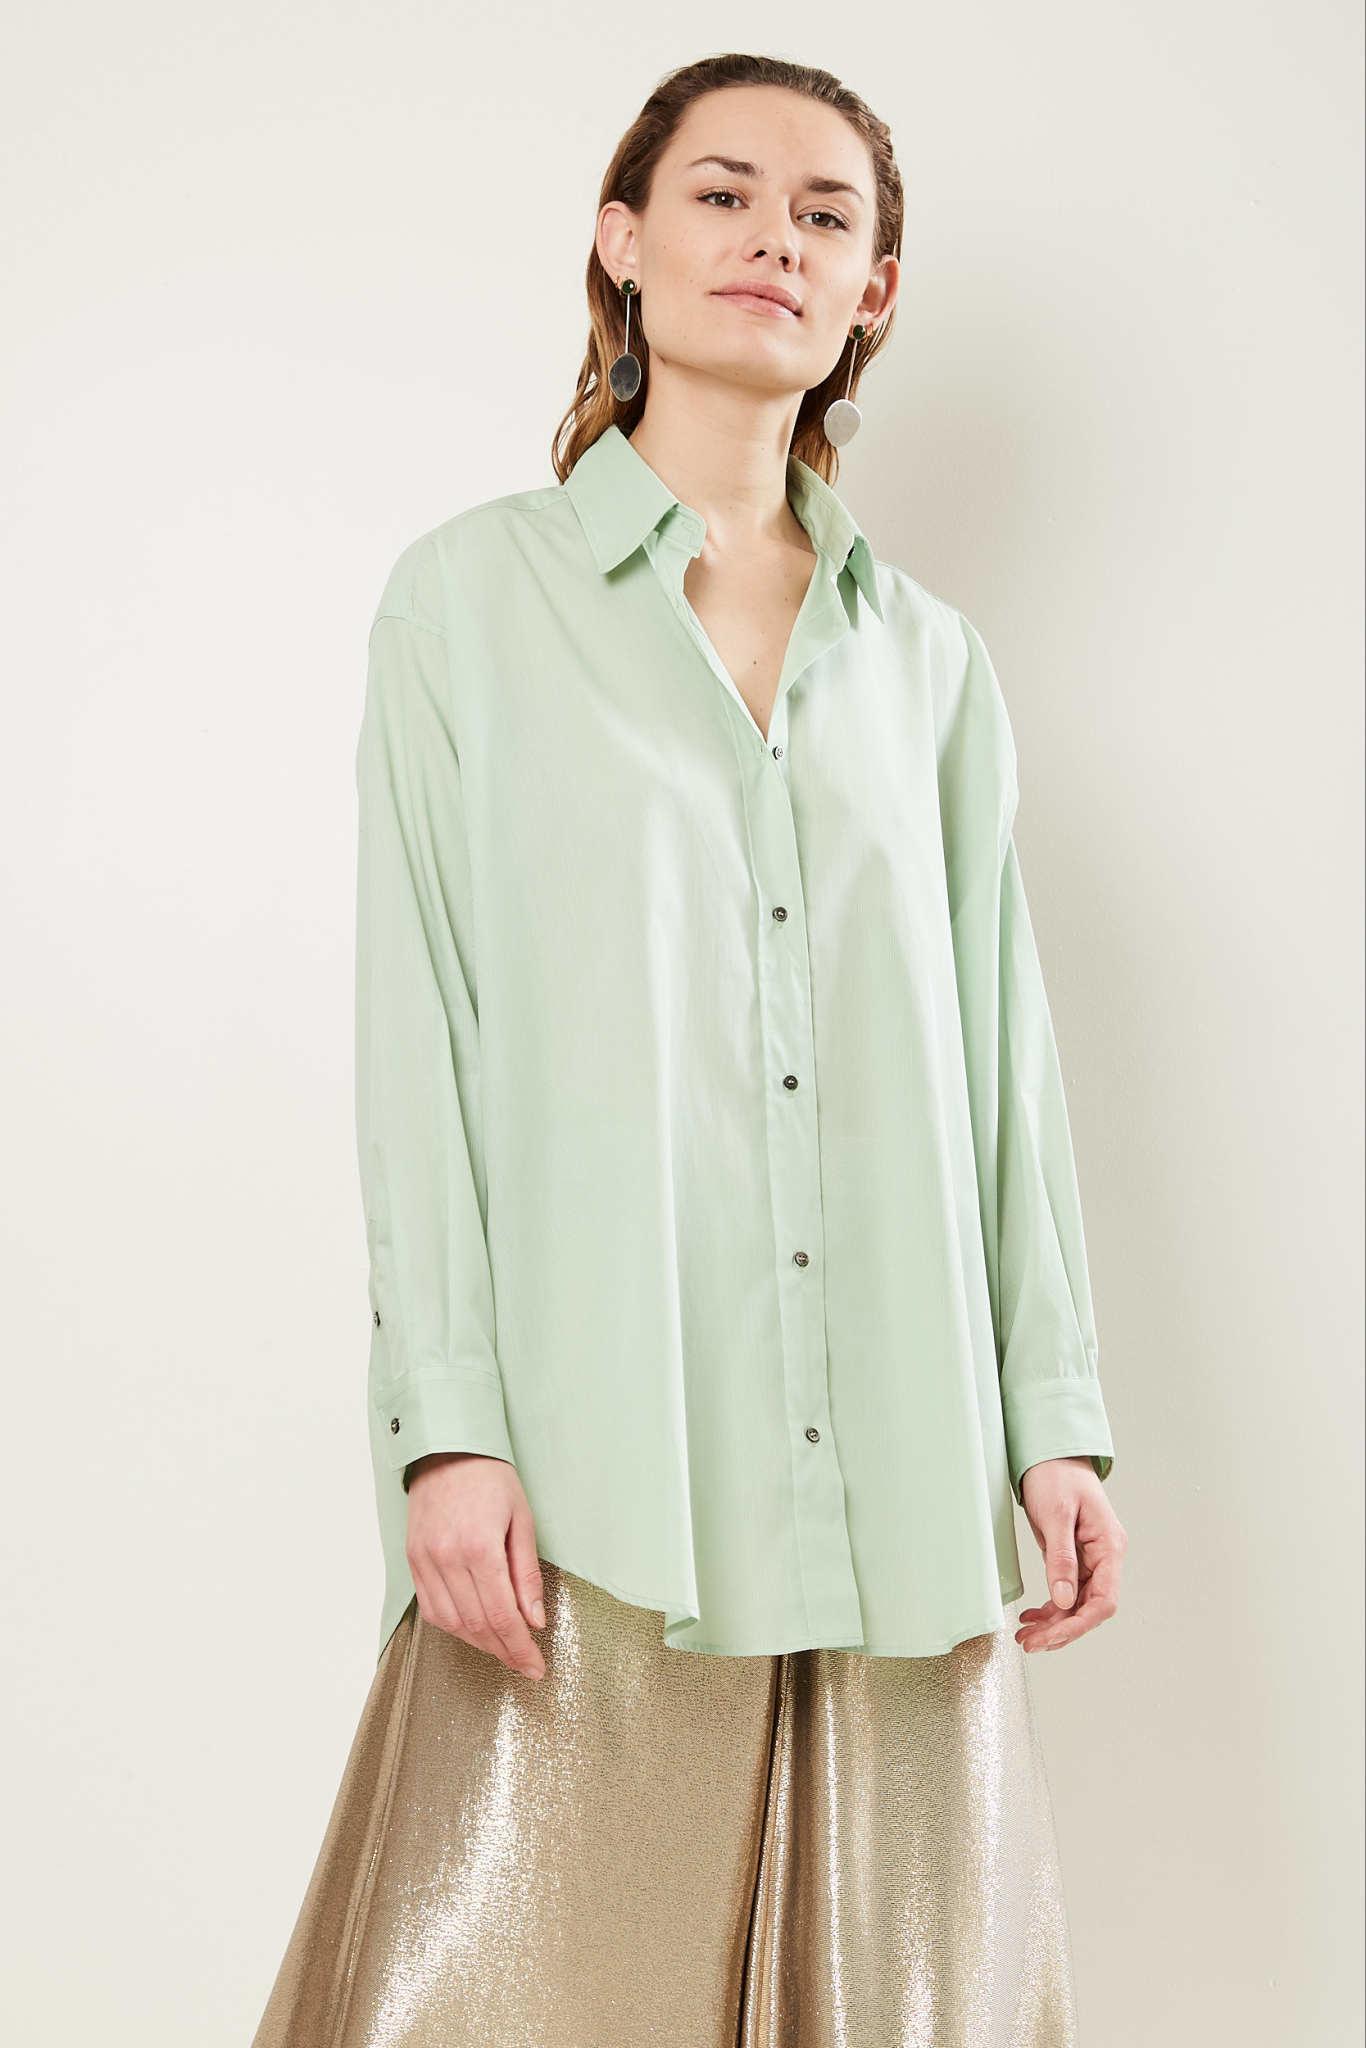 inDRESS - Oversize cotton shirt